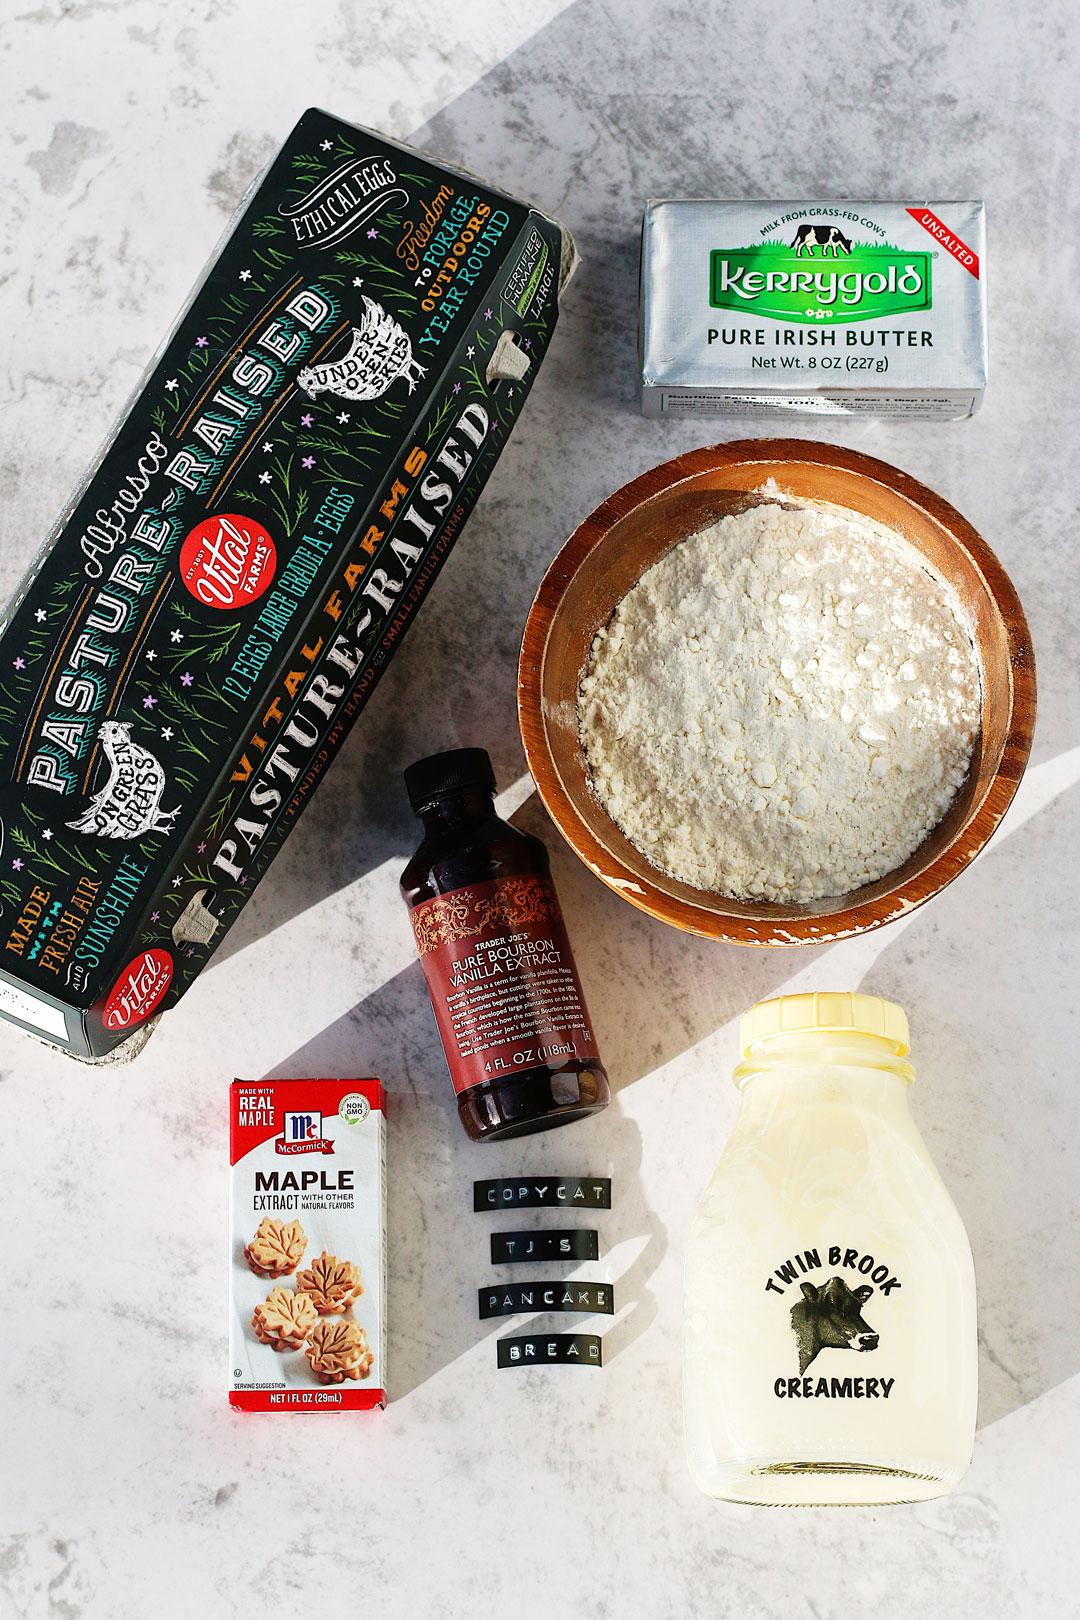 herbakinglab-copycat-trader-joe's-pancake-bread-recipe-prep-ingredients